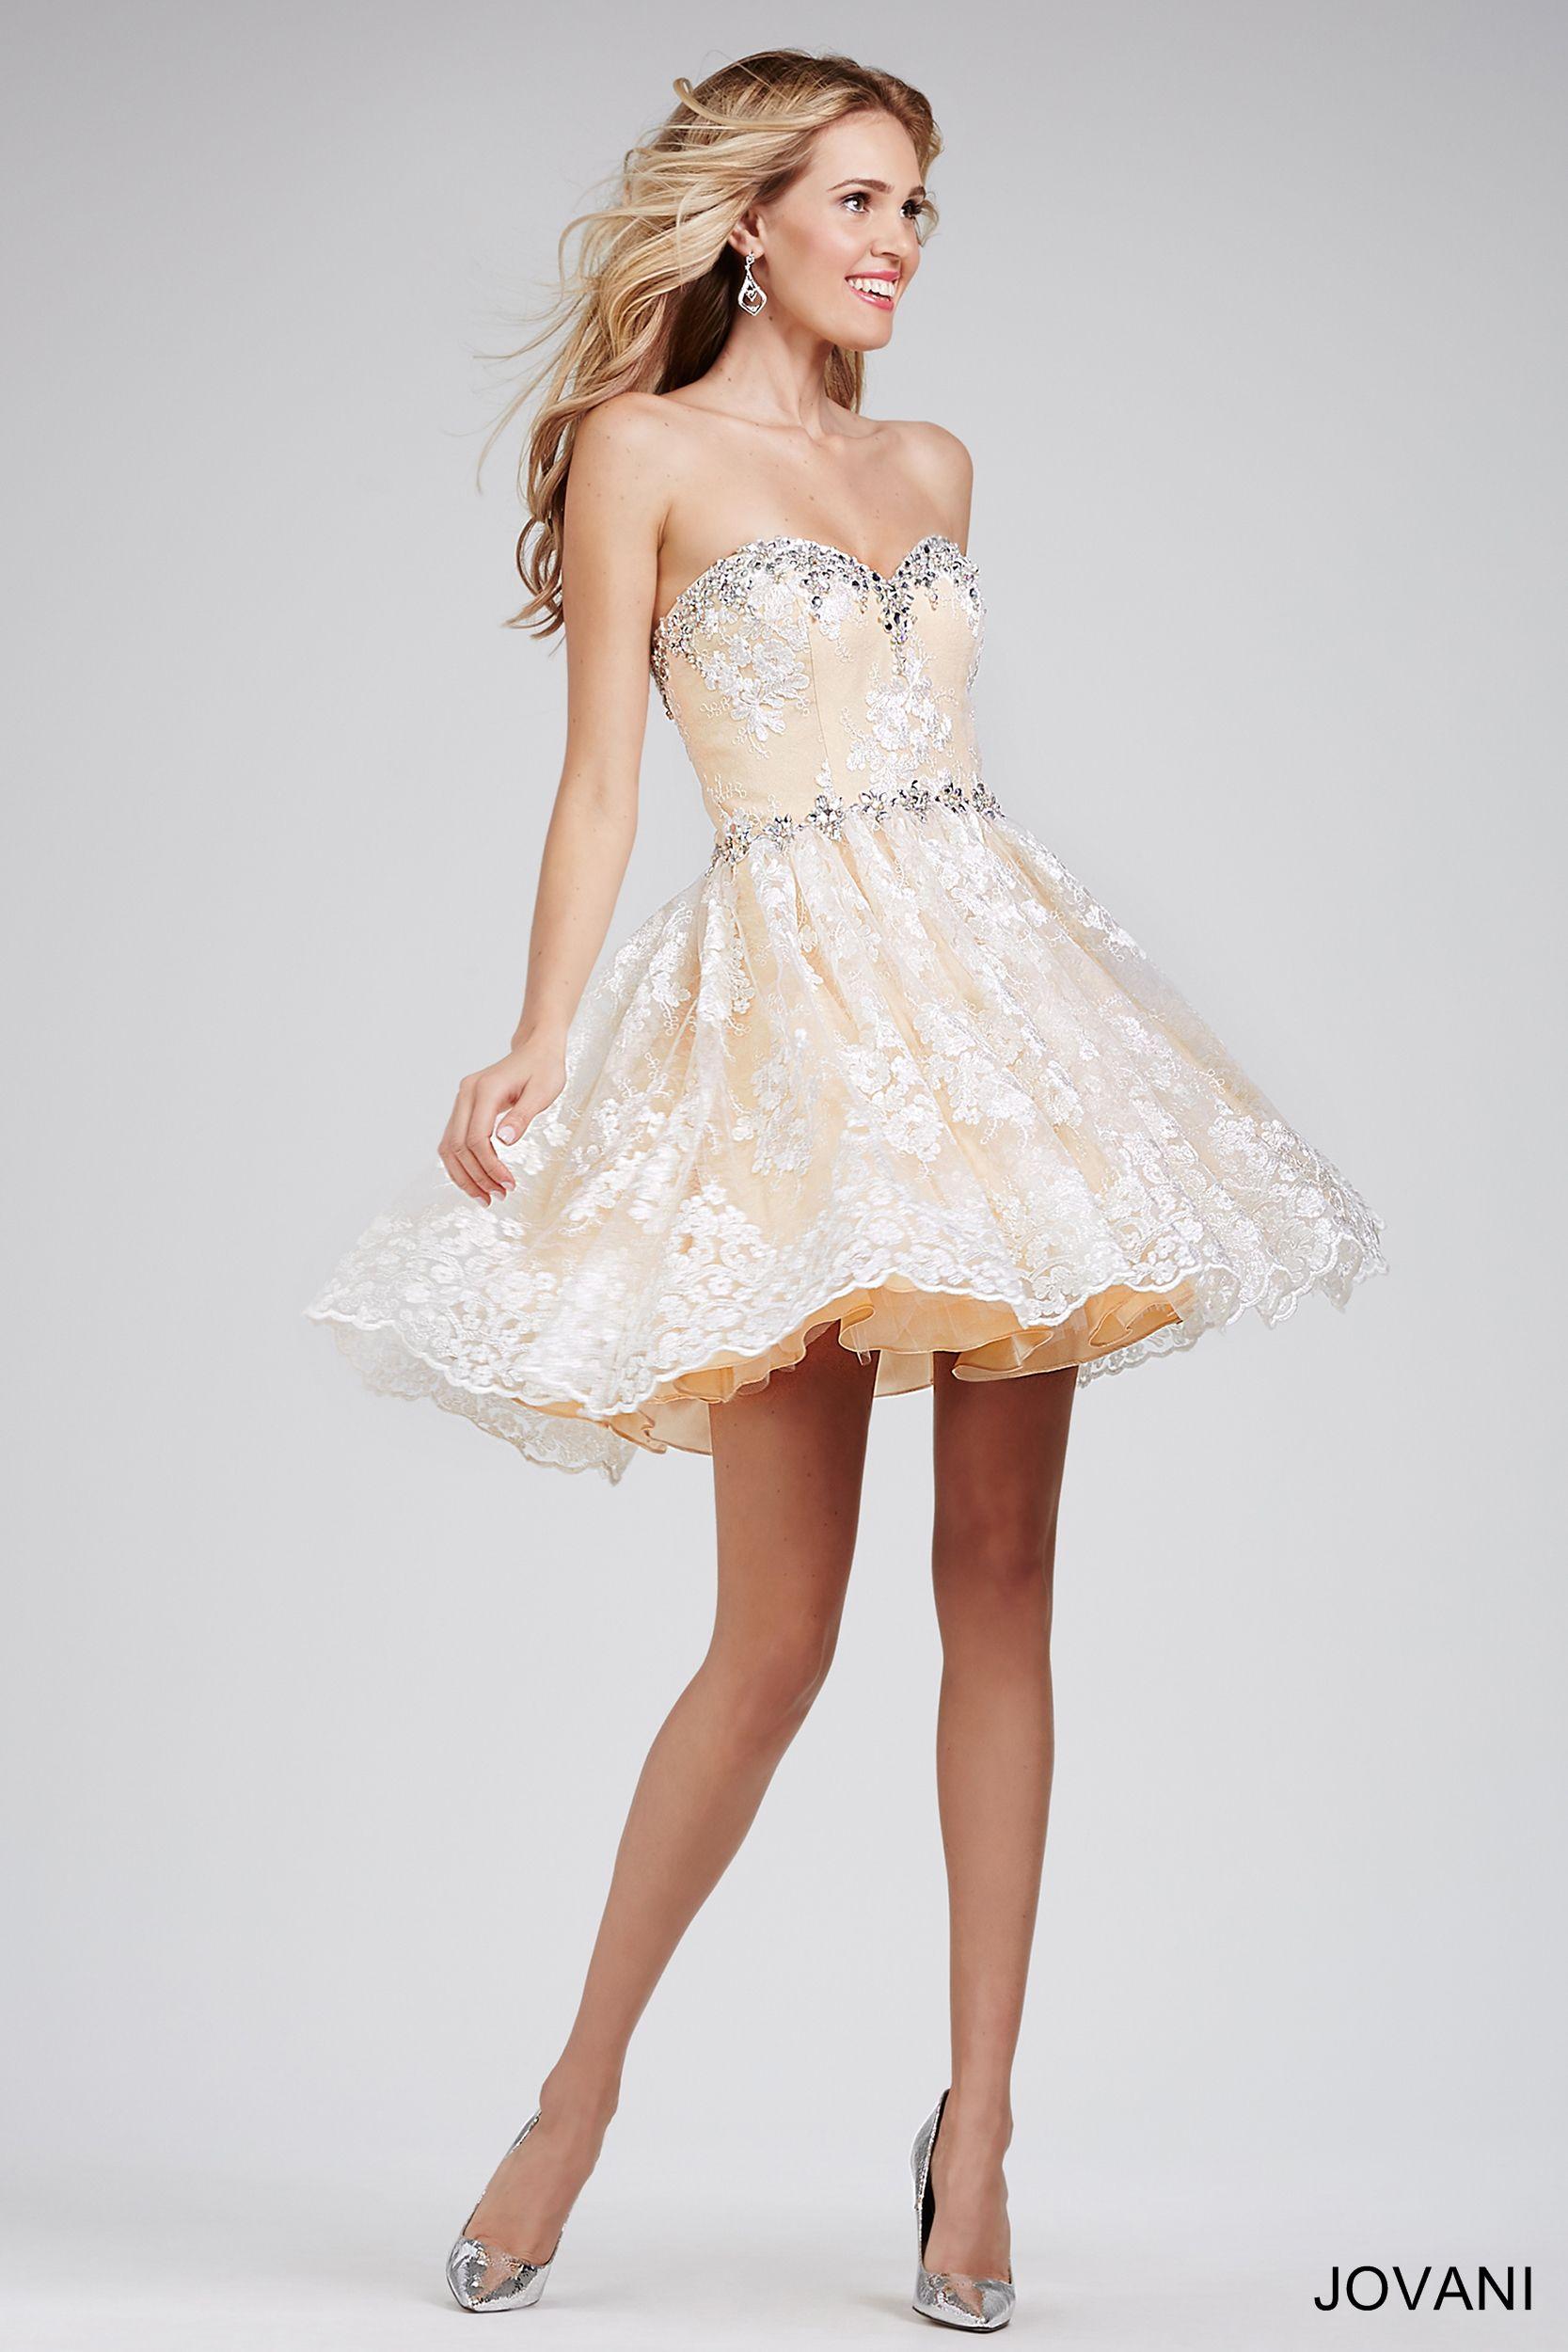 27+ Cheap Cream Homecoming Dresses